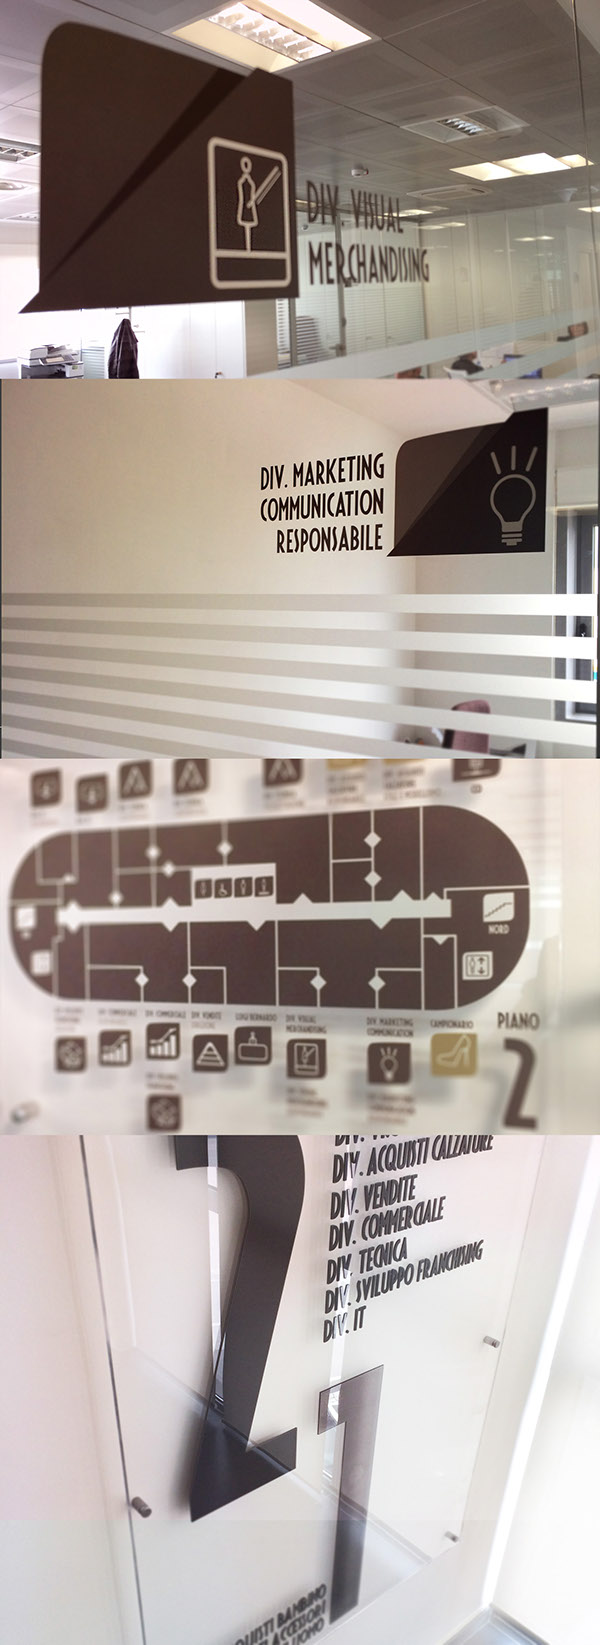 Piazza Italia pittogrammi Icon iconset pictogram wayfinding Office nola NAPOLI